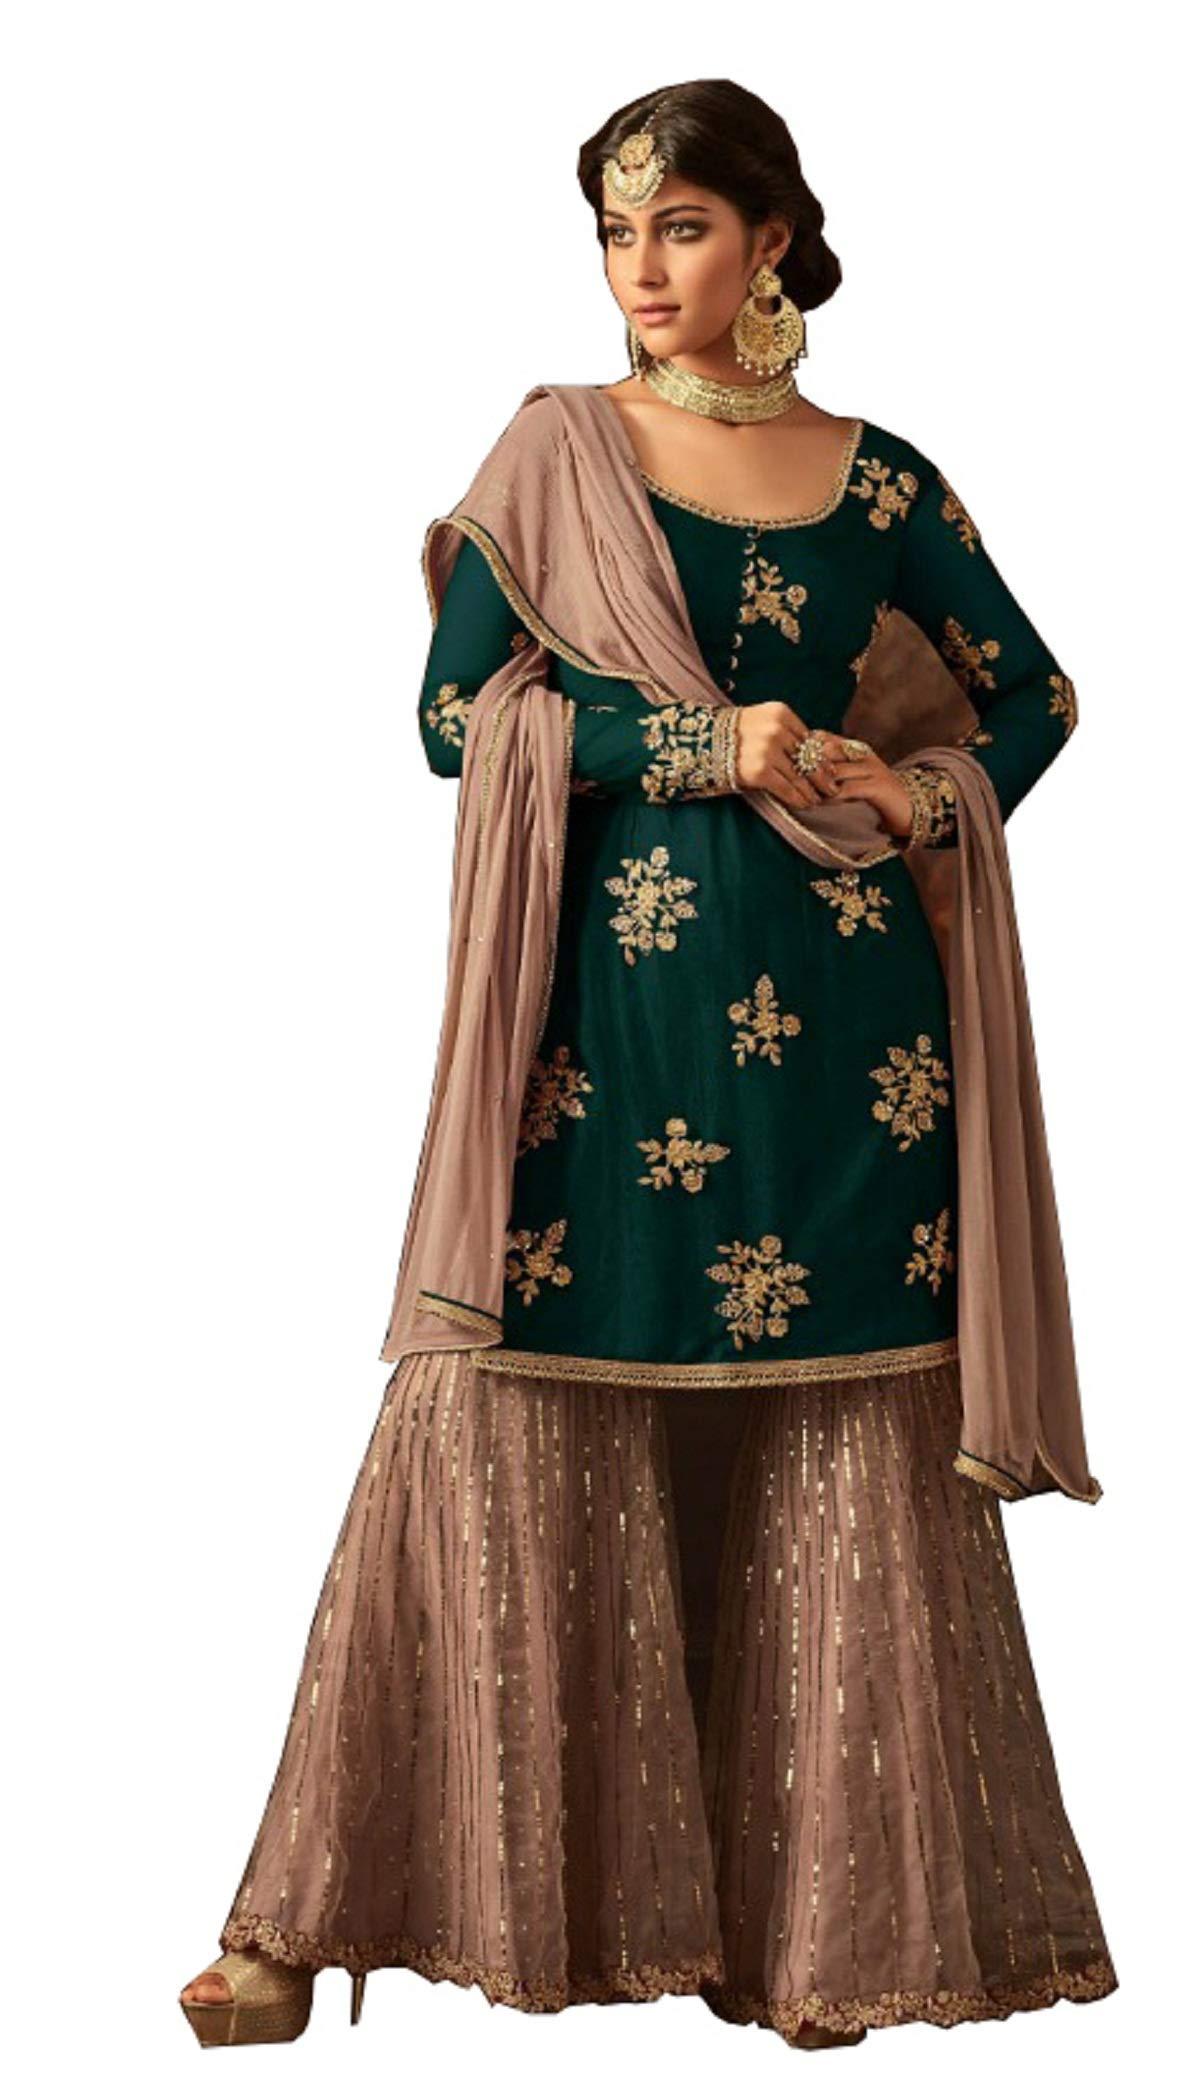 London Collection Indian Pakistani Bollywood Designer Women Ethnic Wear Salwar Kameez Salwar Suit (Green, 10(X-Small))